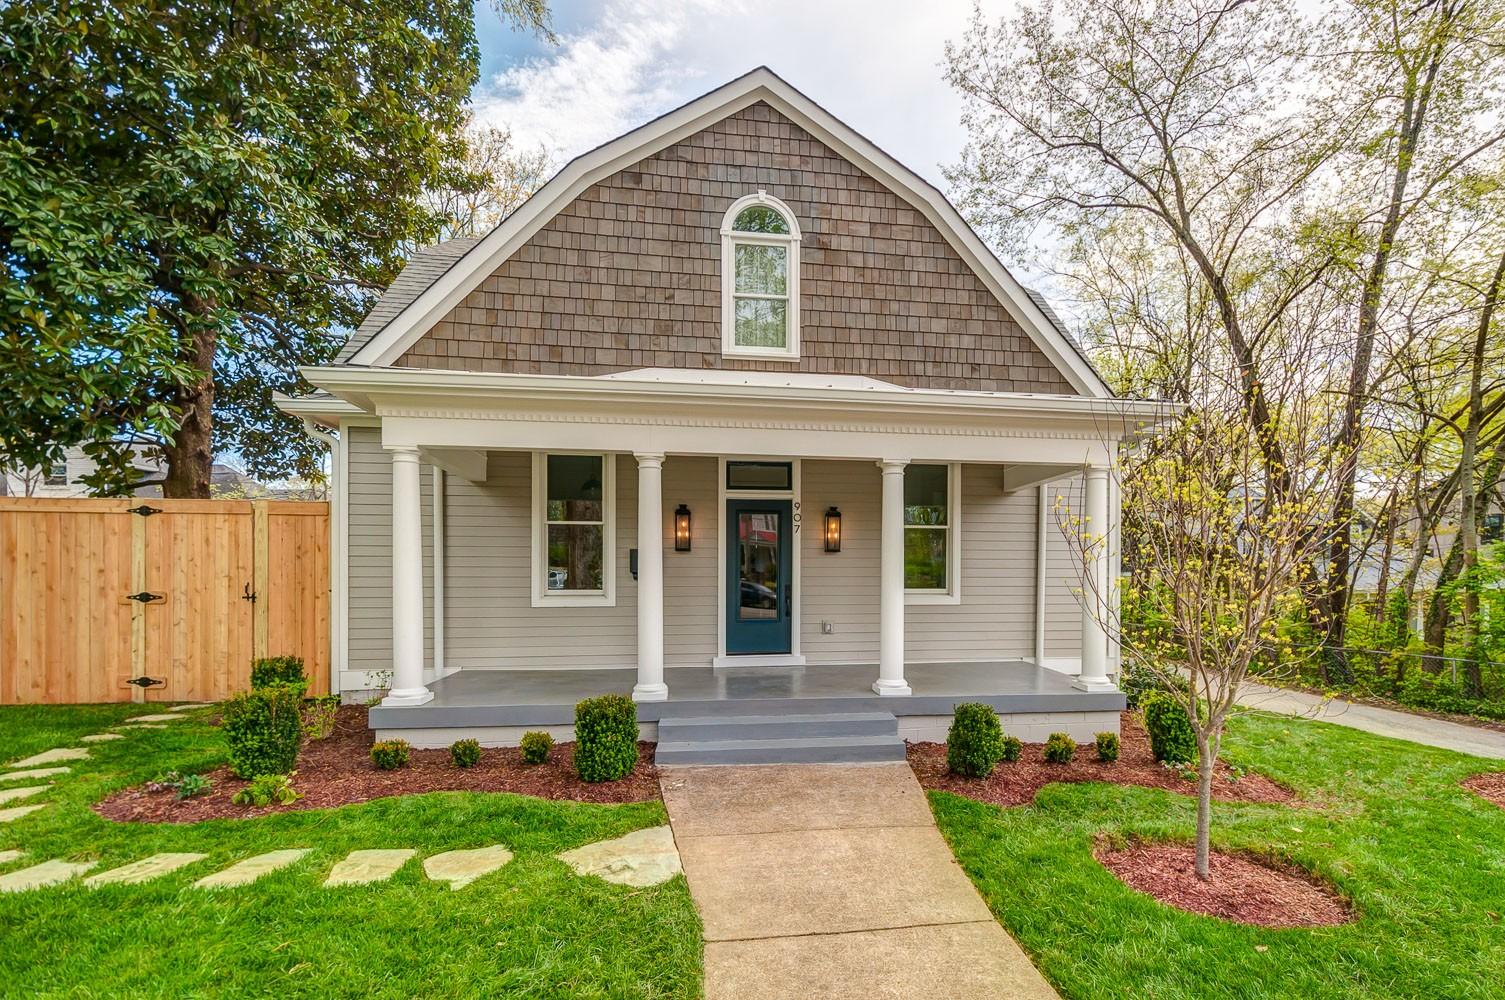 907 S Douglas Ave, Nashville, TN 37204 - Nashville, TN real estate listing